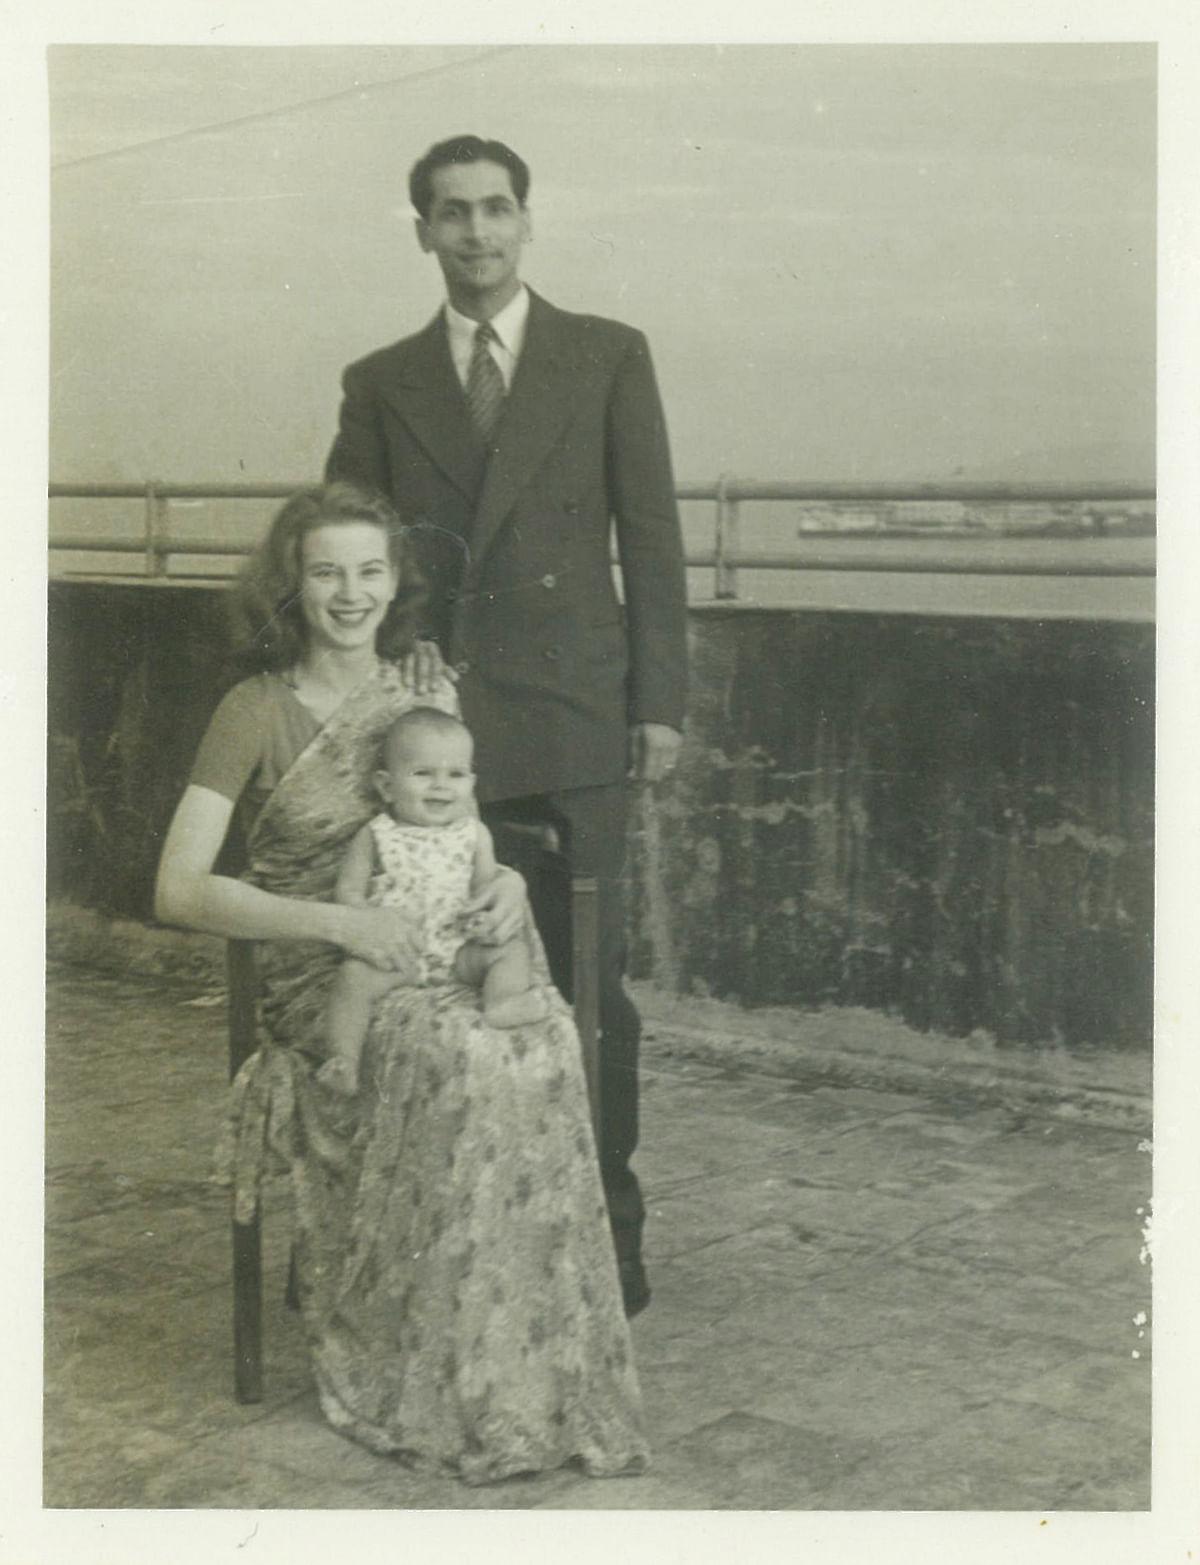 Kawas, Sylvia and their daughter Tannaz (c. 1955). (Photo courtesy: Juggernaut)